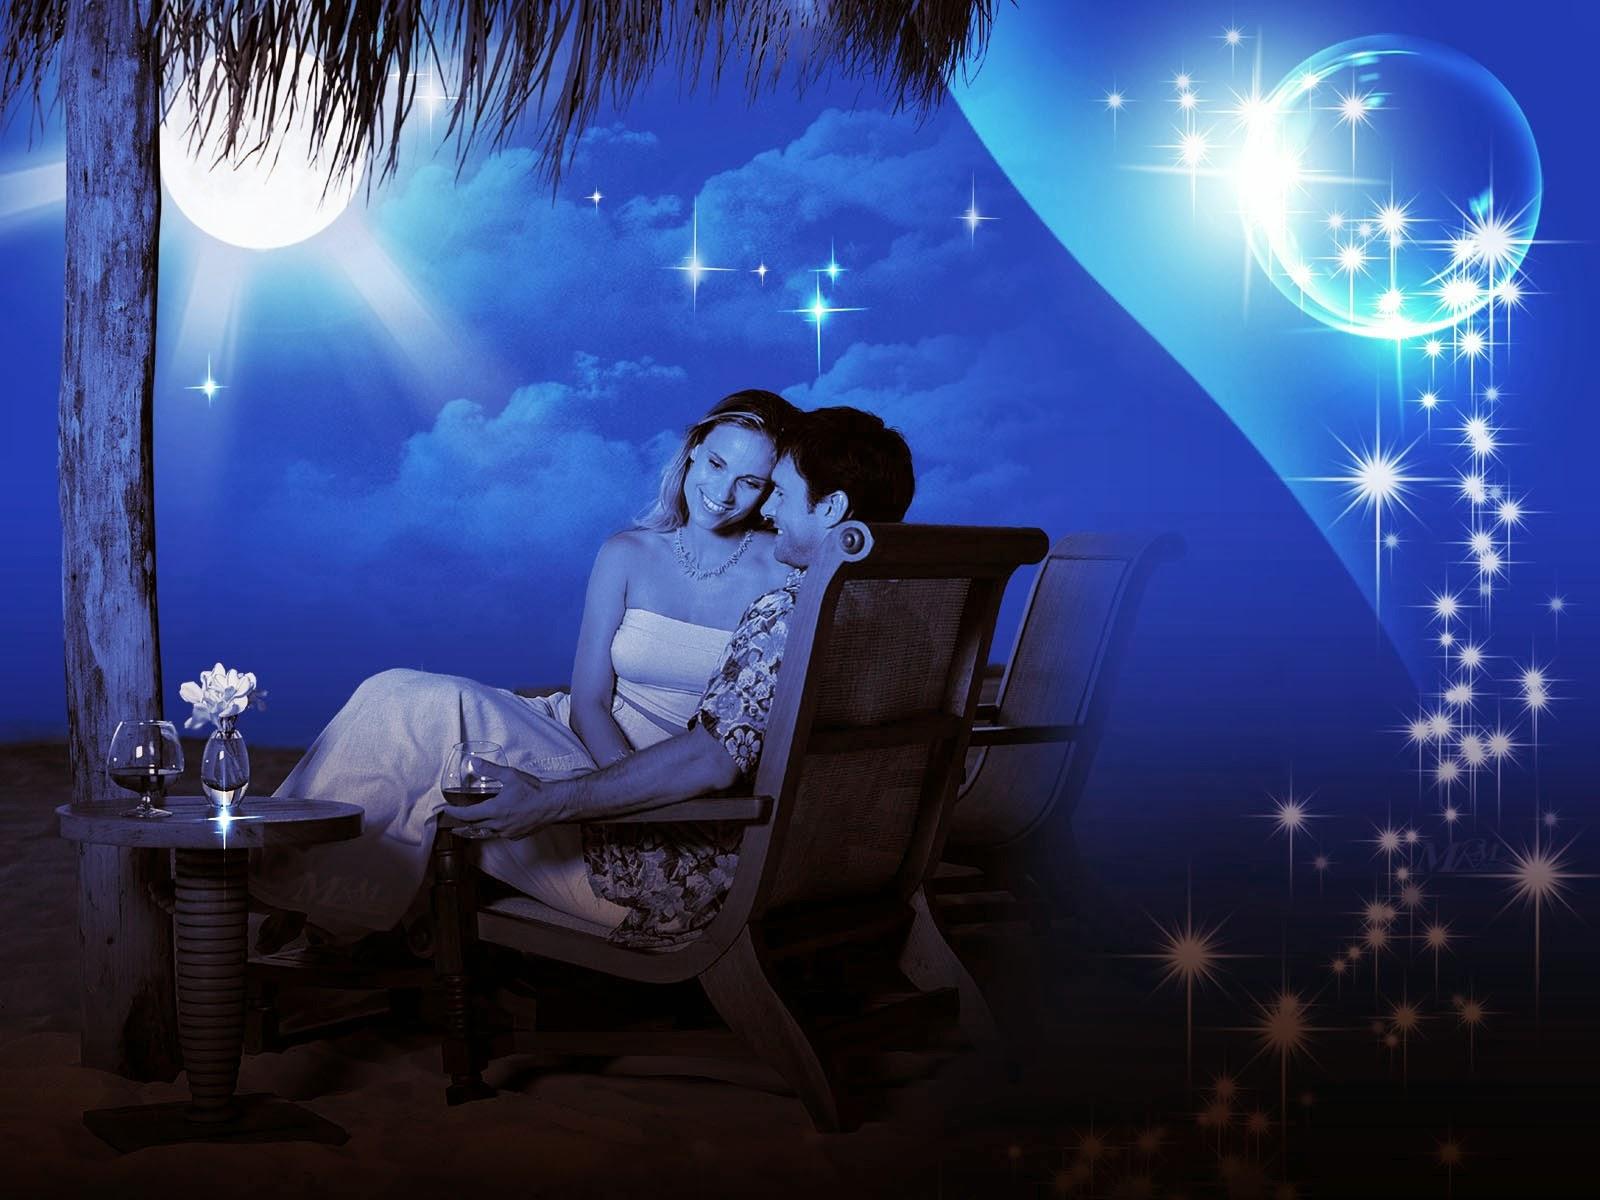 Beautiful Romantic Love Hd Wallpapers For Couples: صور خلفيات حب وشوق جميلة للكمبيوتر اتش دي والاب توب والفيس